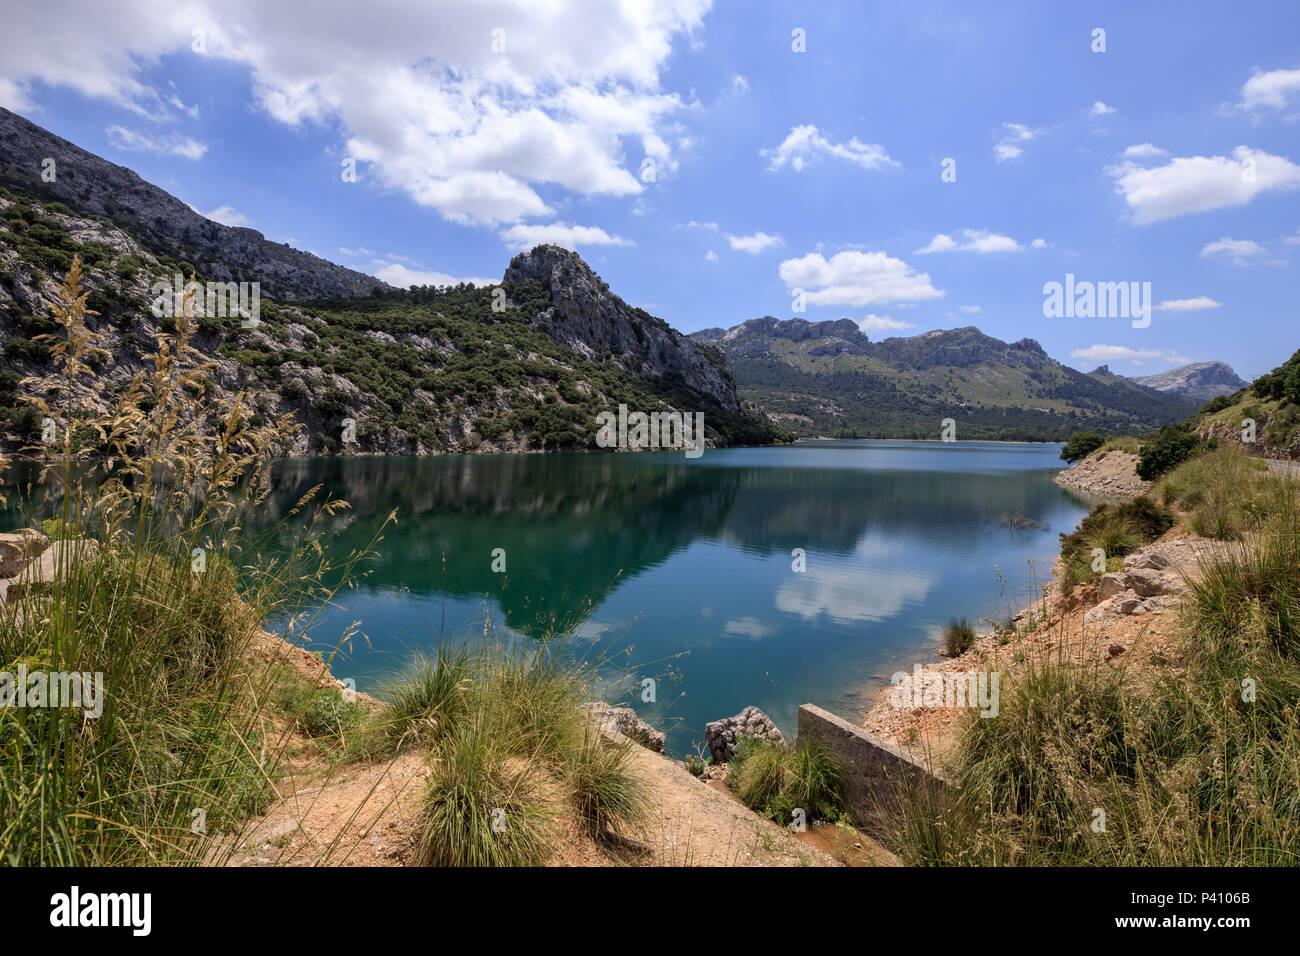 Gorg Blau, artifical lake, water reserve supply Majorca Spain Stock Photo